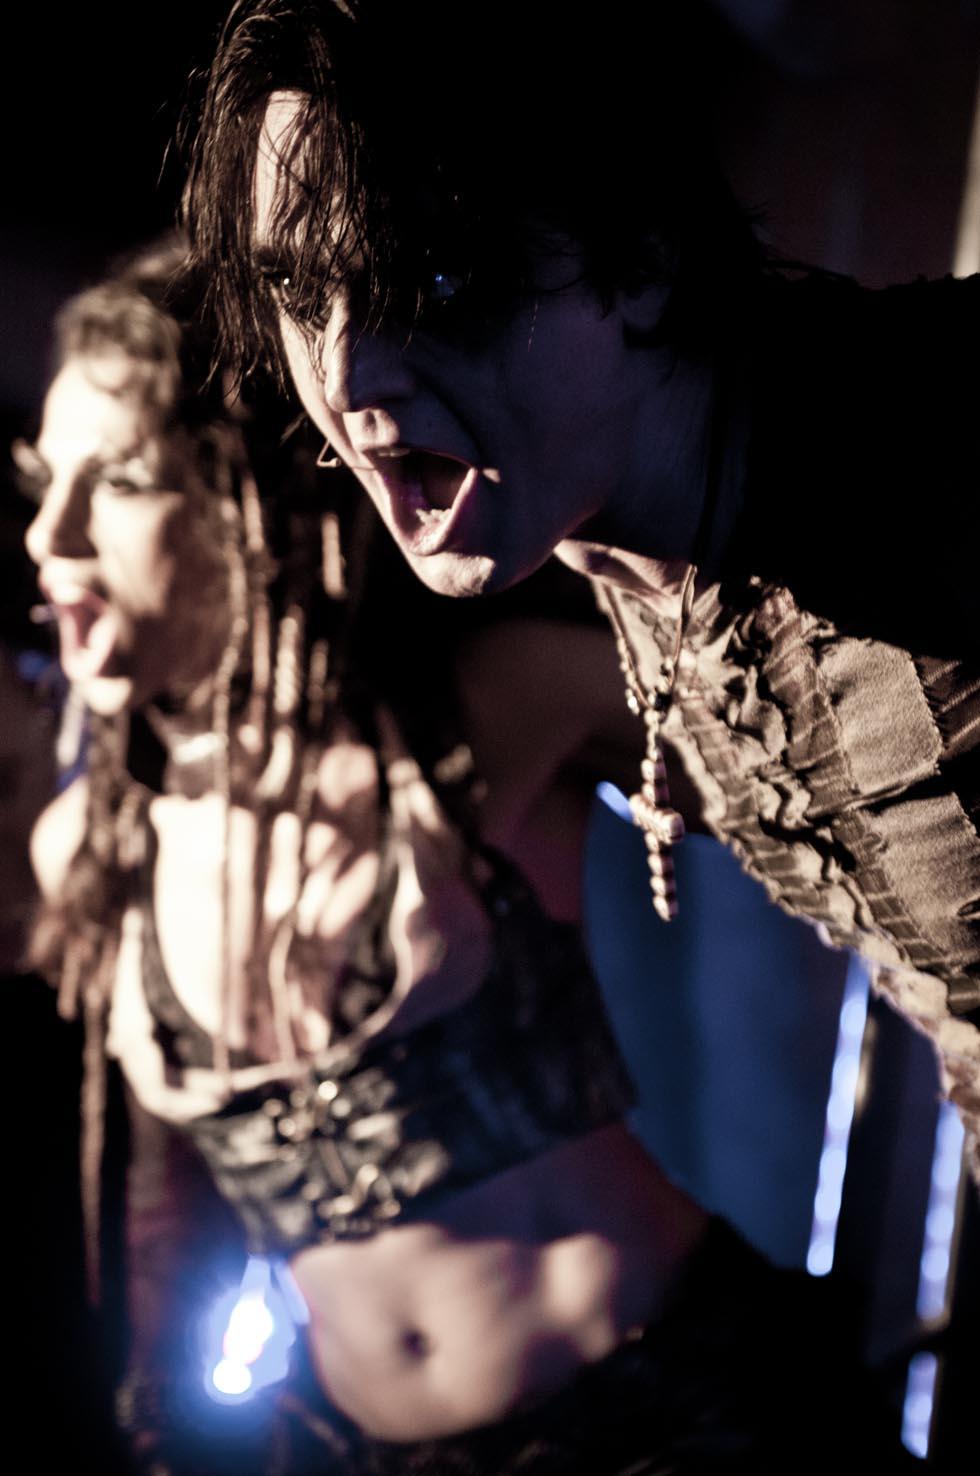 zum-schneider-nyc-2012-karneval-apocalyptika-5320.jpg